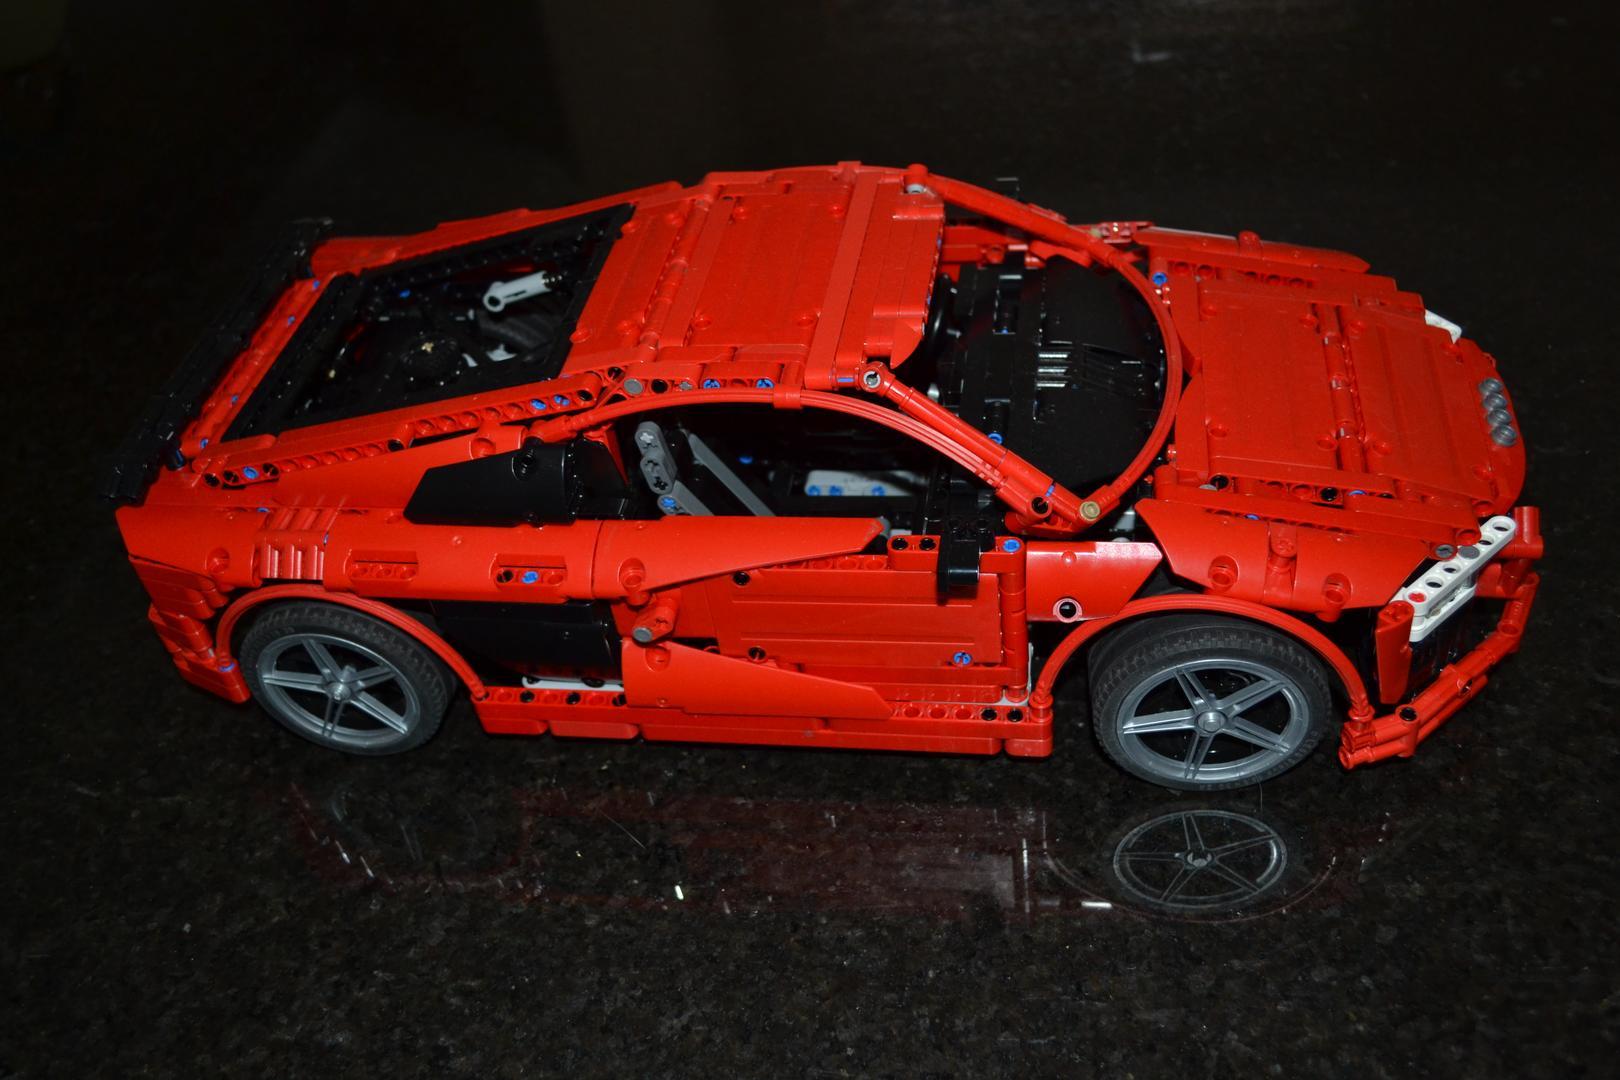 Lego Moc 4463 Audi R8 V10 Second Generation Technic 2016